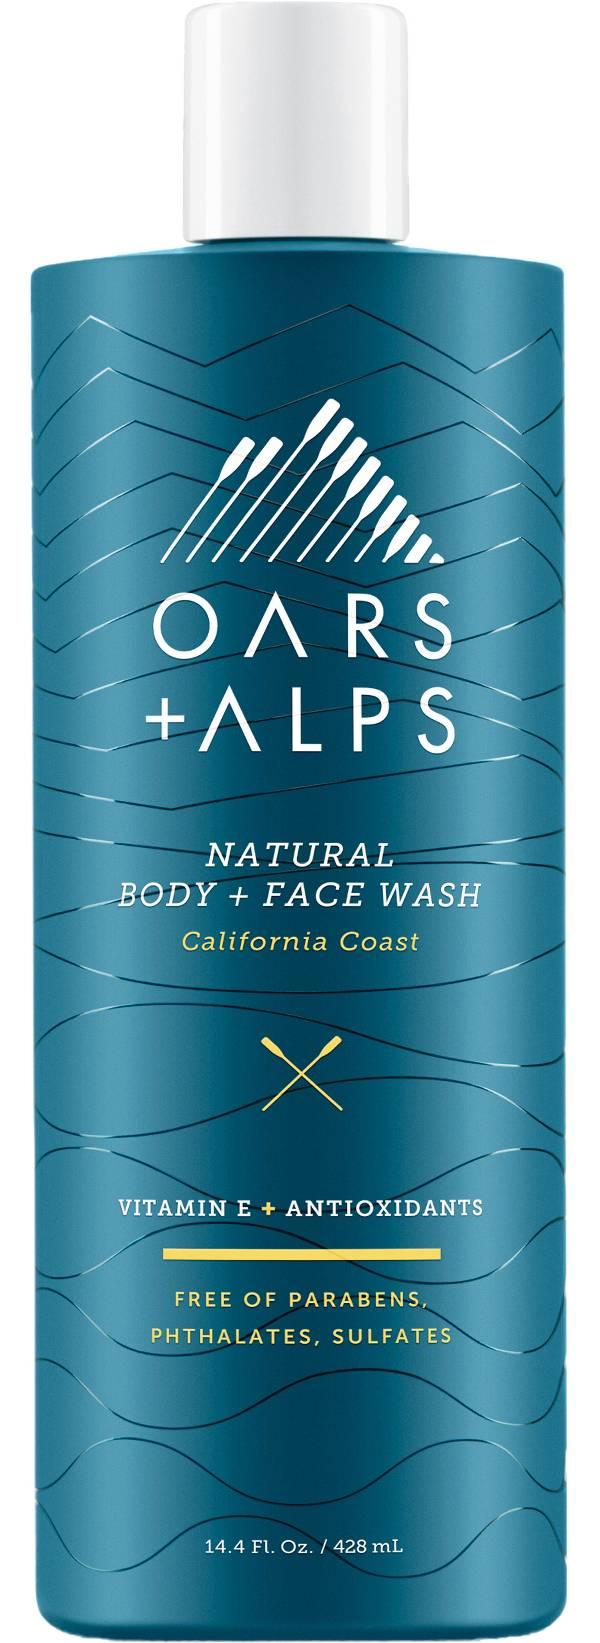 Oars + Alps Men's California Coast Body Wash product image